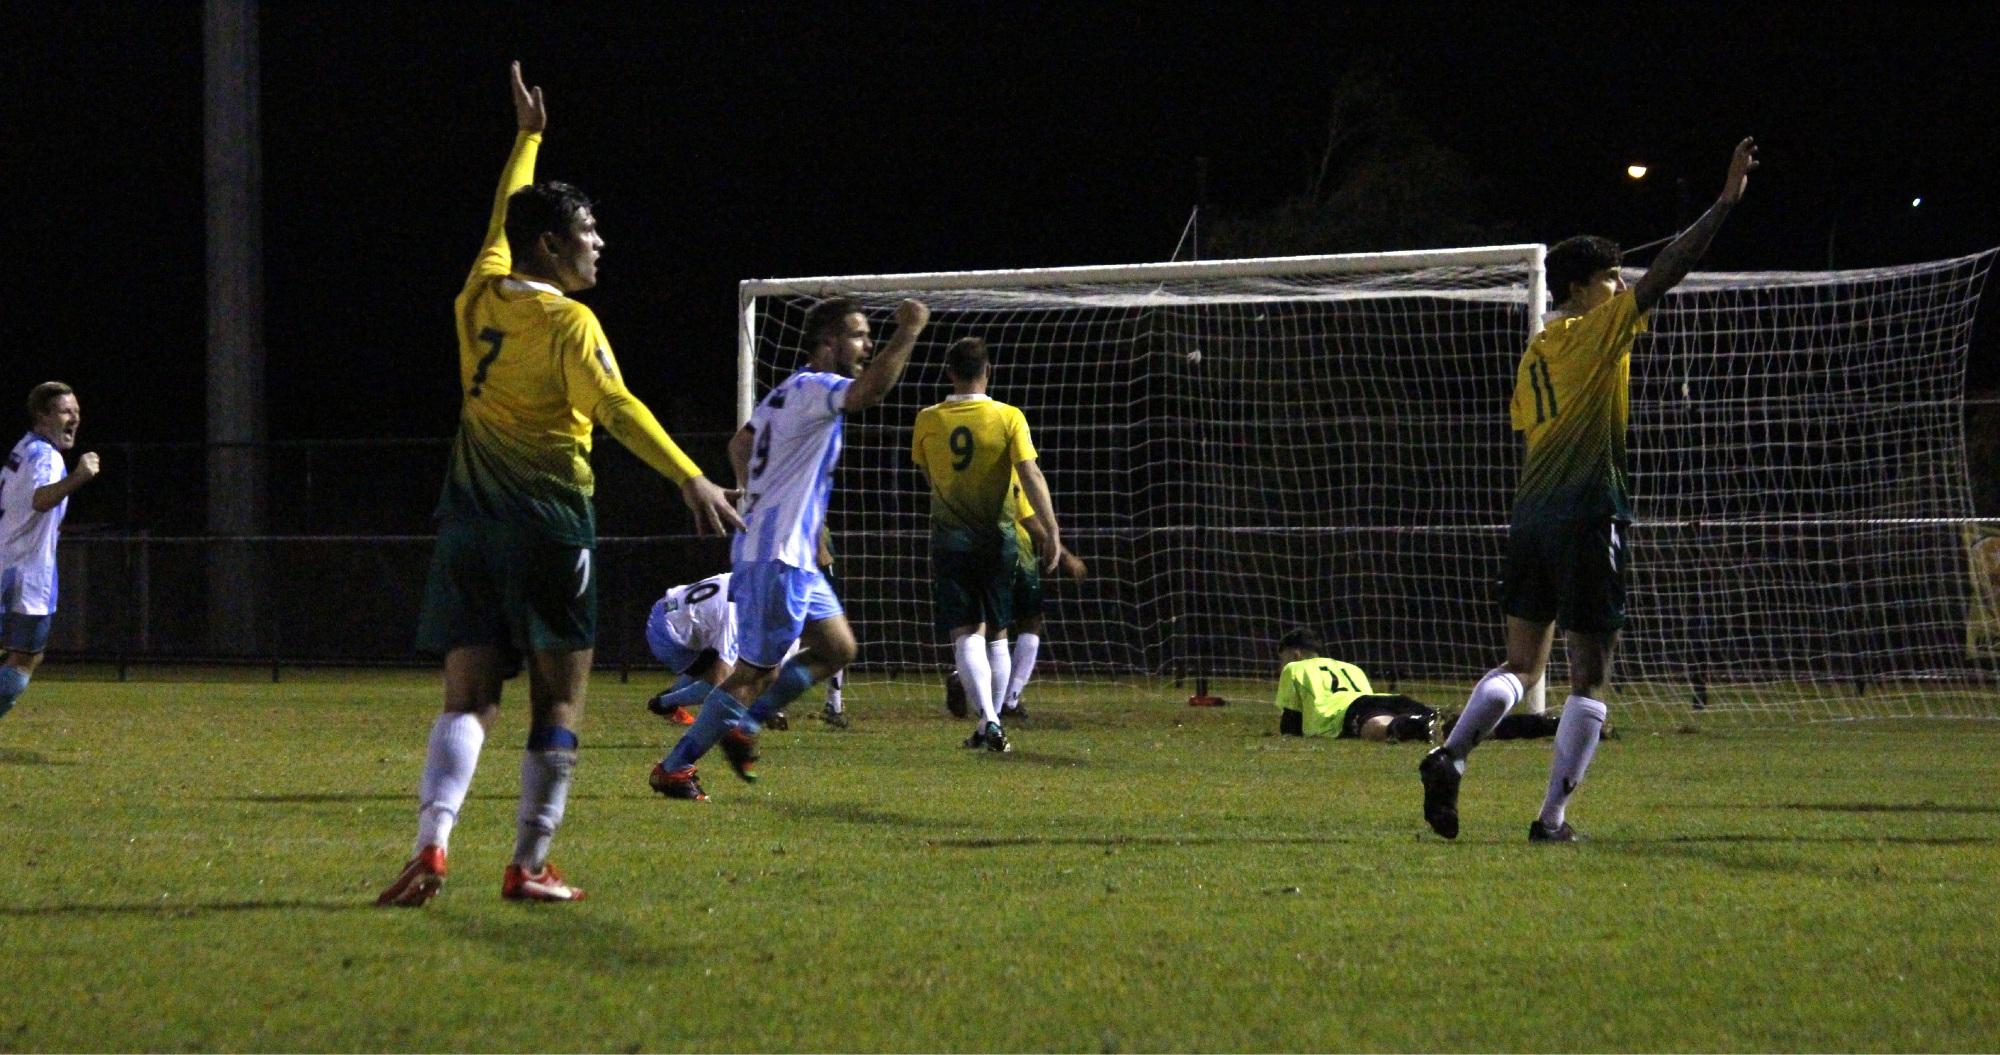 Rockingham City players appeal for offside, but it is in vain as Jordan Rhodes nets Mandurah's winner. Picture: Declan Byrne